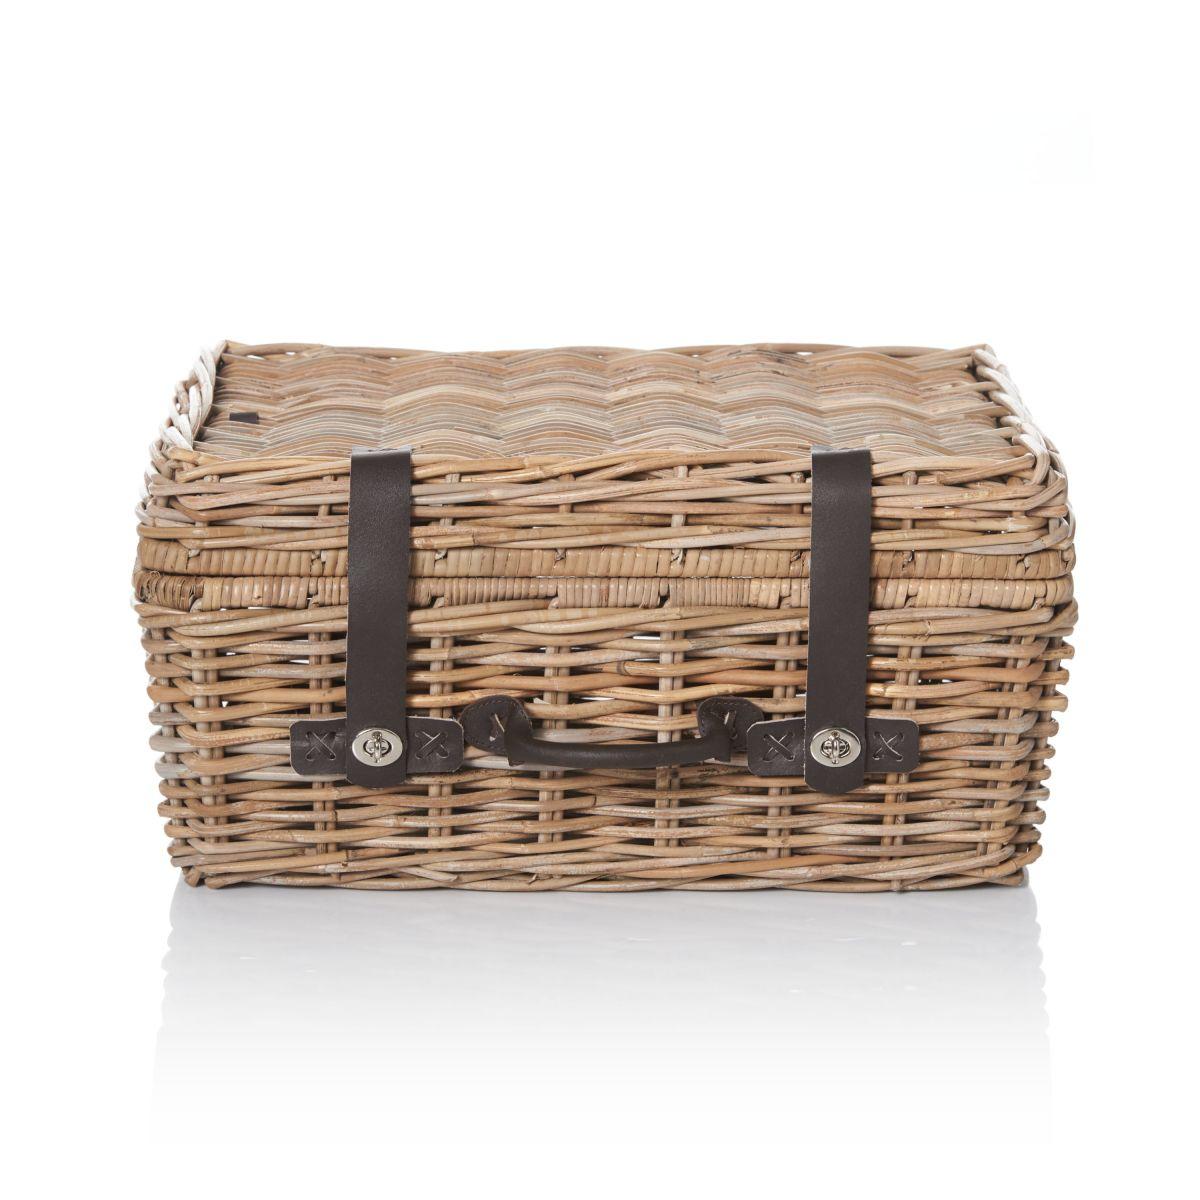 Koffer, klassisch, Rattan